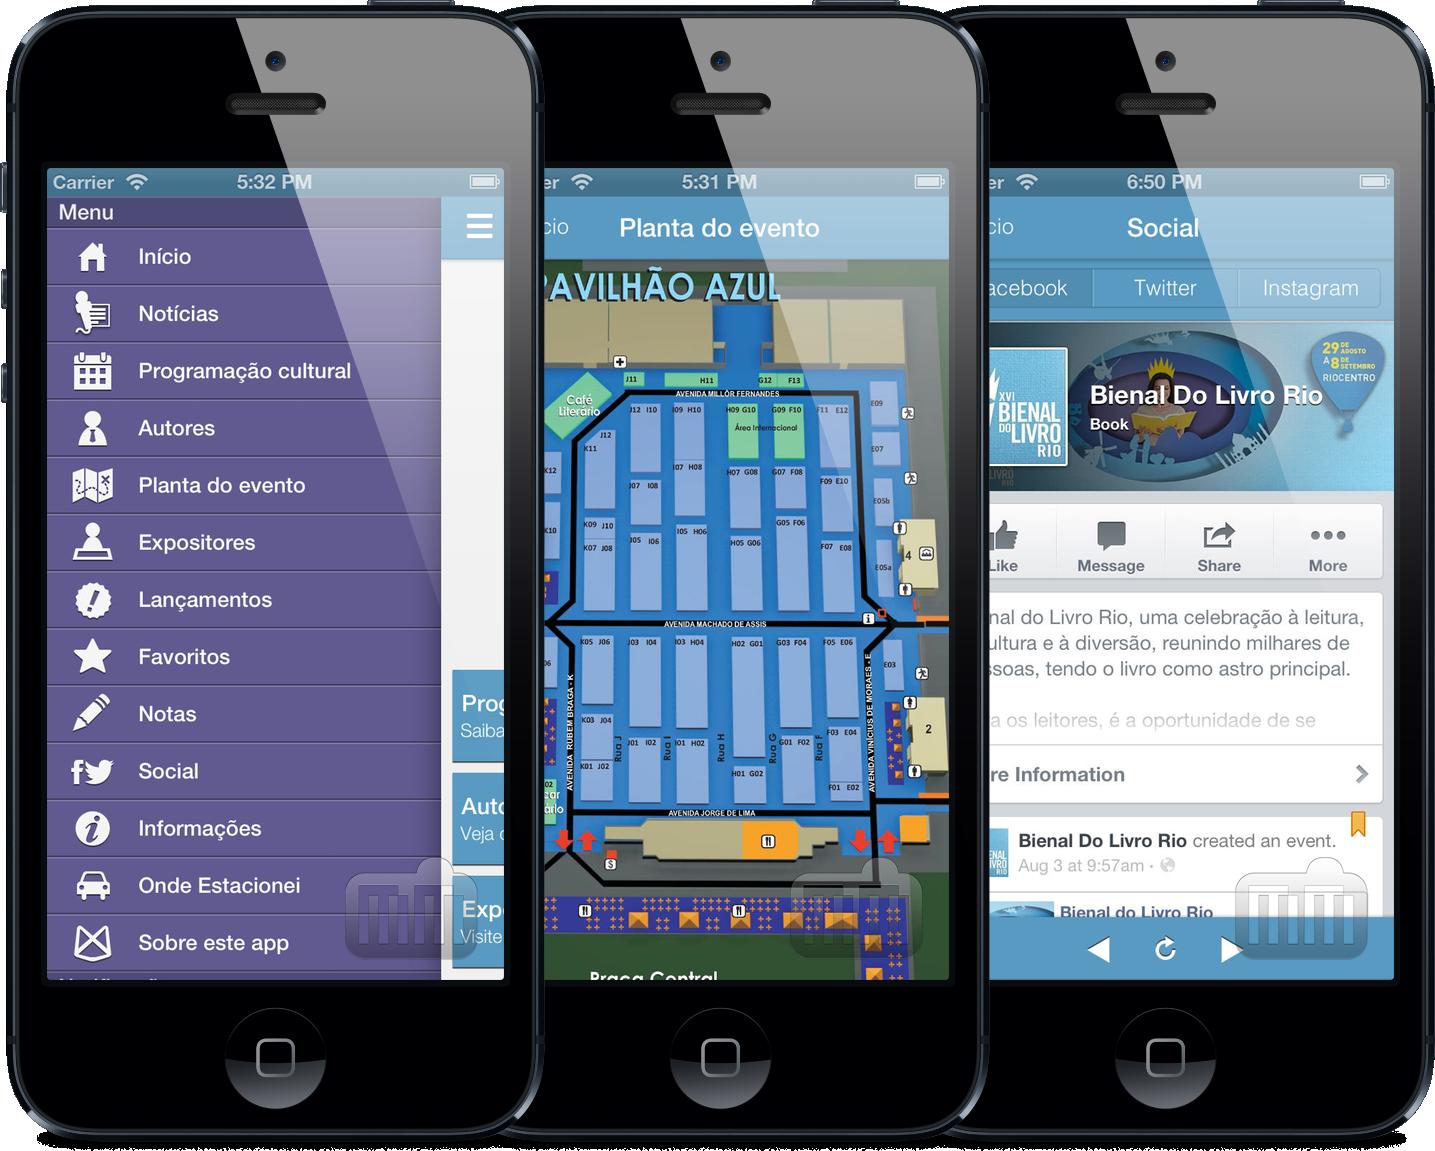 App Bienal do Livro 2013 para iPhones/iPods touch